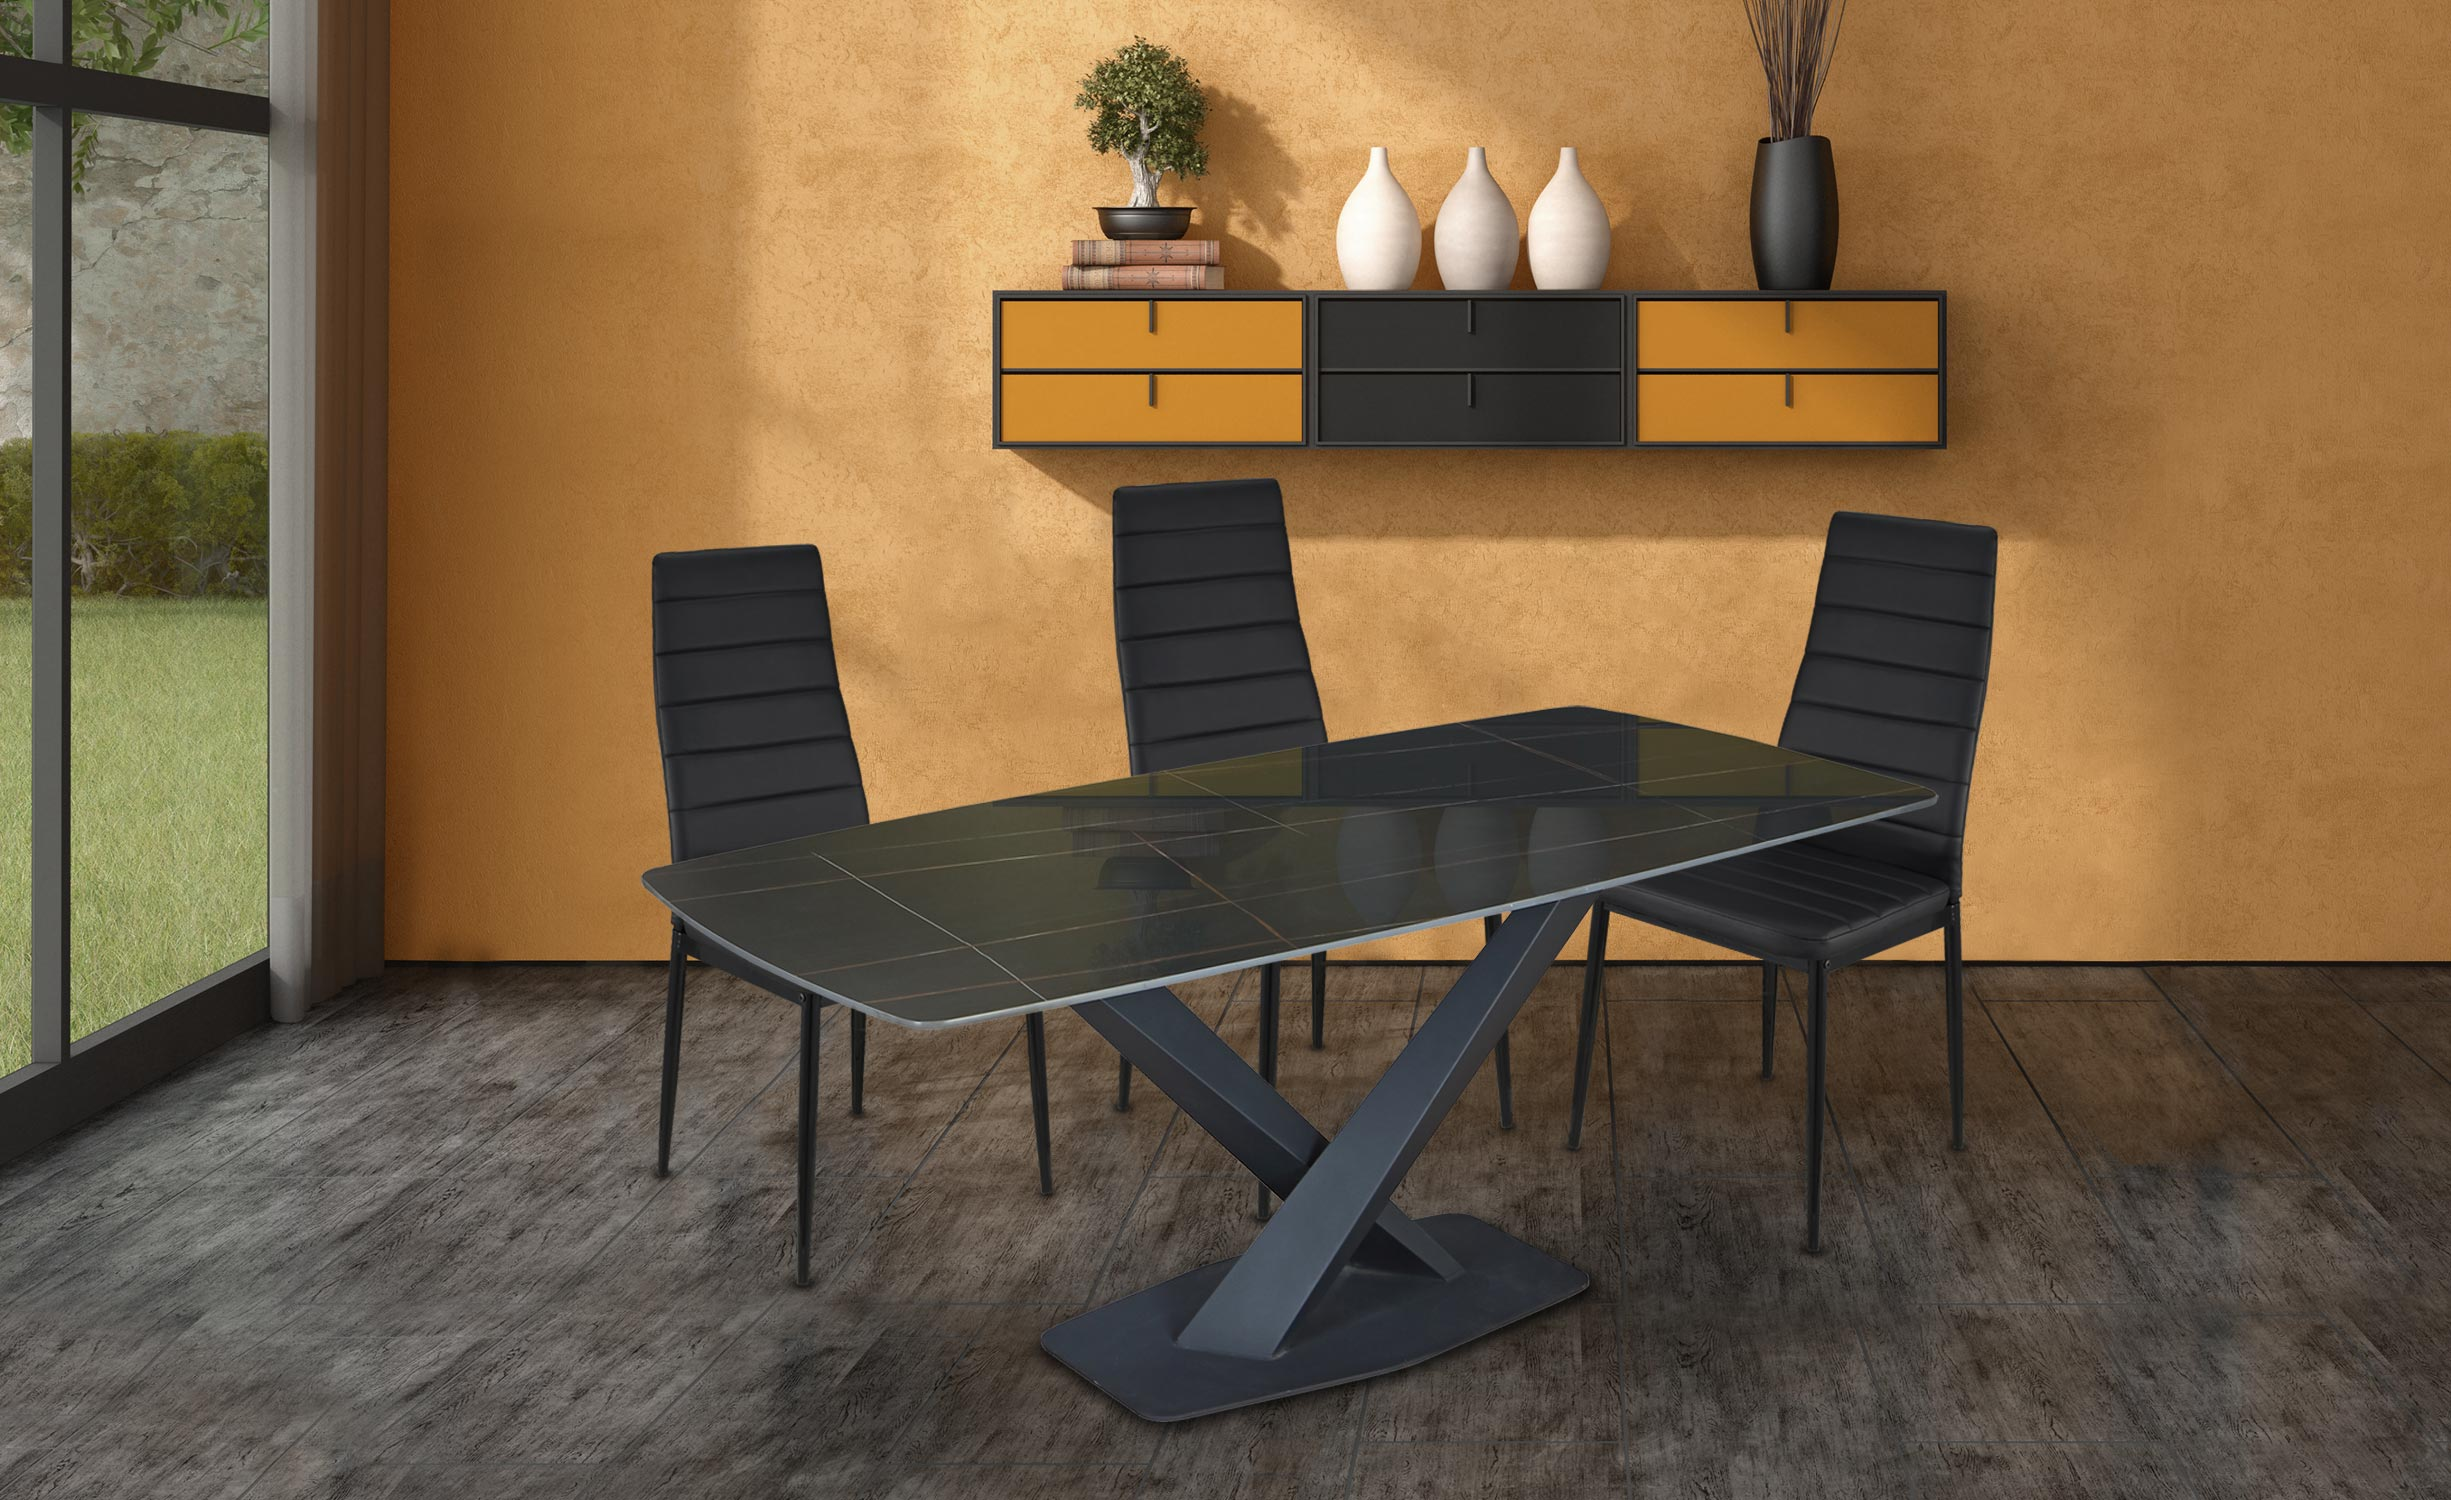 Table Axena en Verre Noir